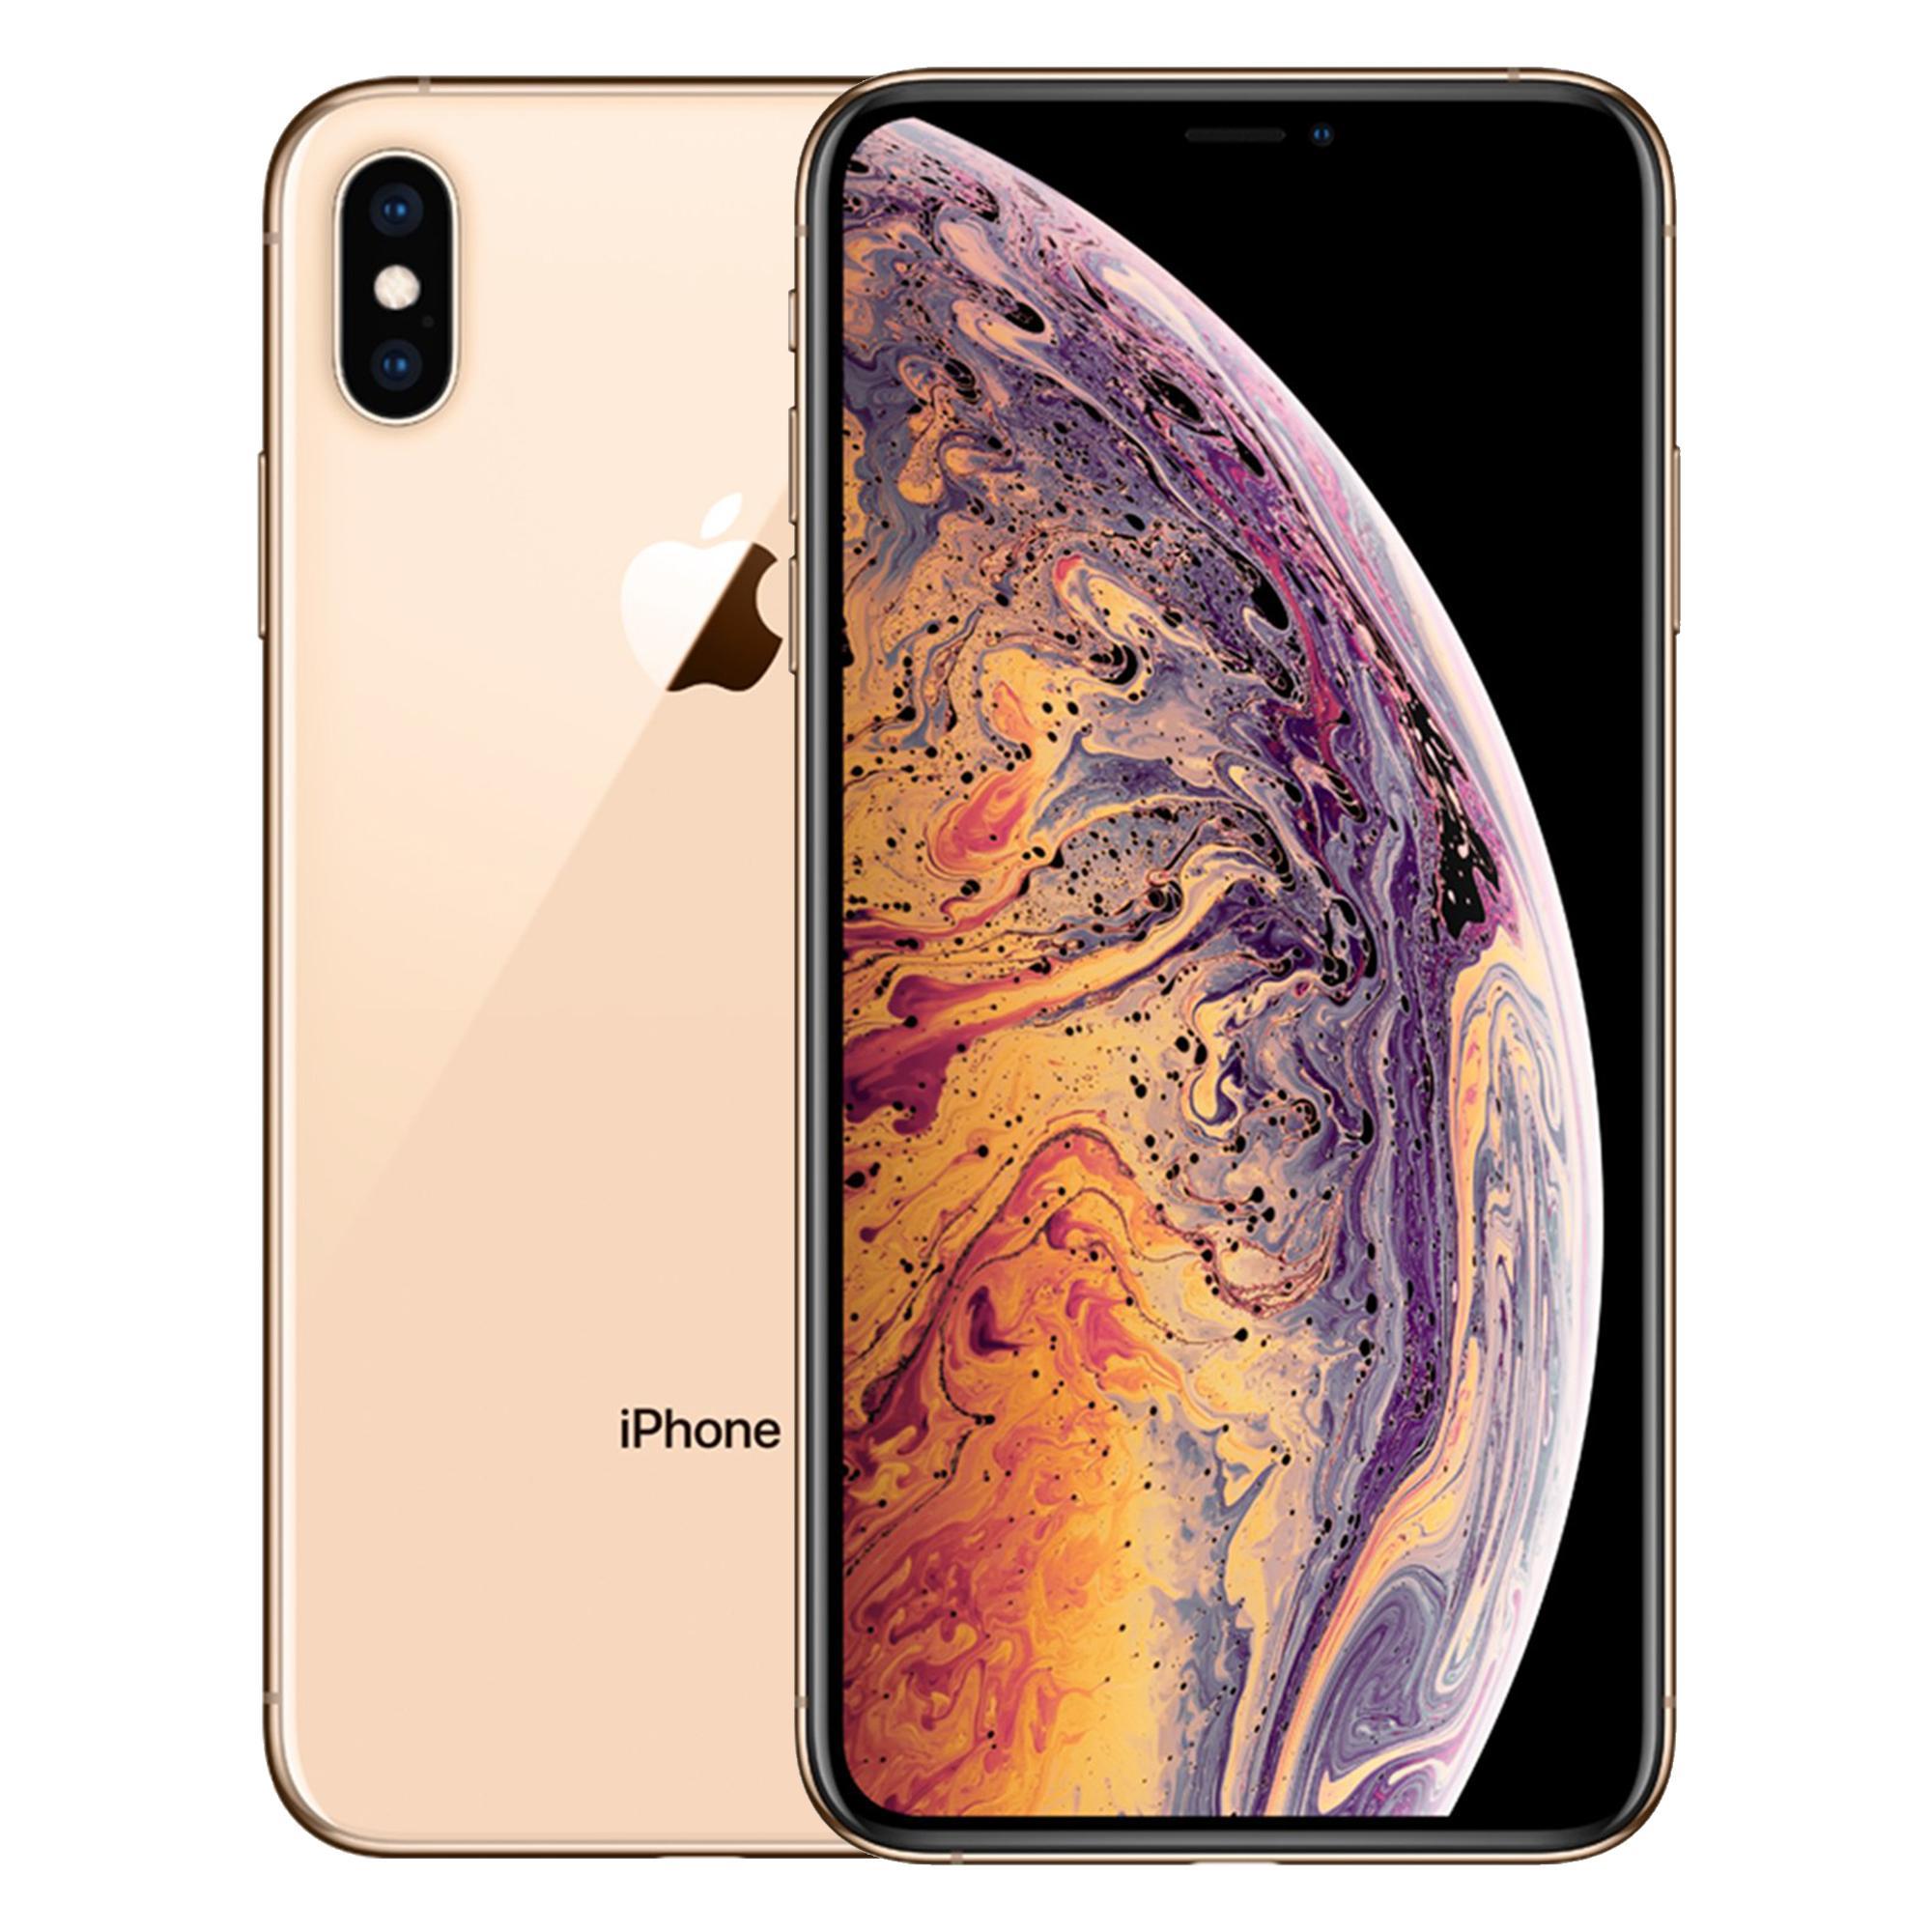 dd32e373e iPhone Price in Pakistan 2019 | Apple iPhones on Installments - Daraz.pk